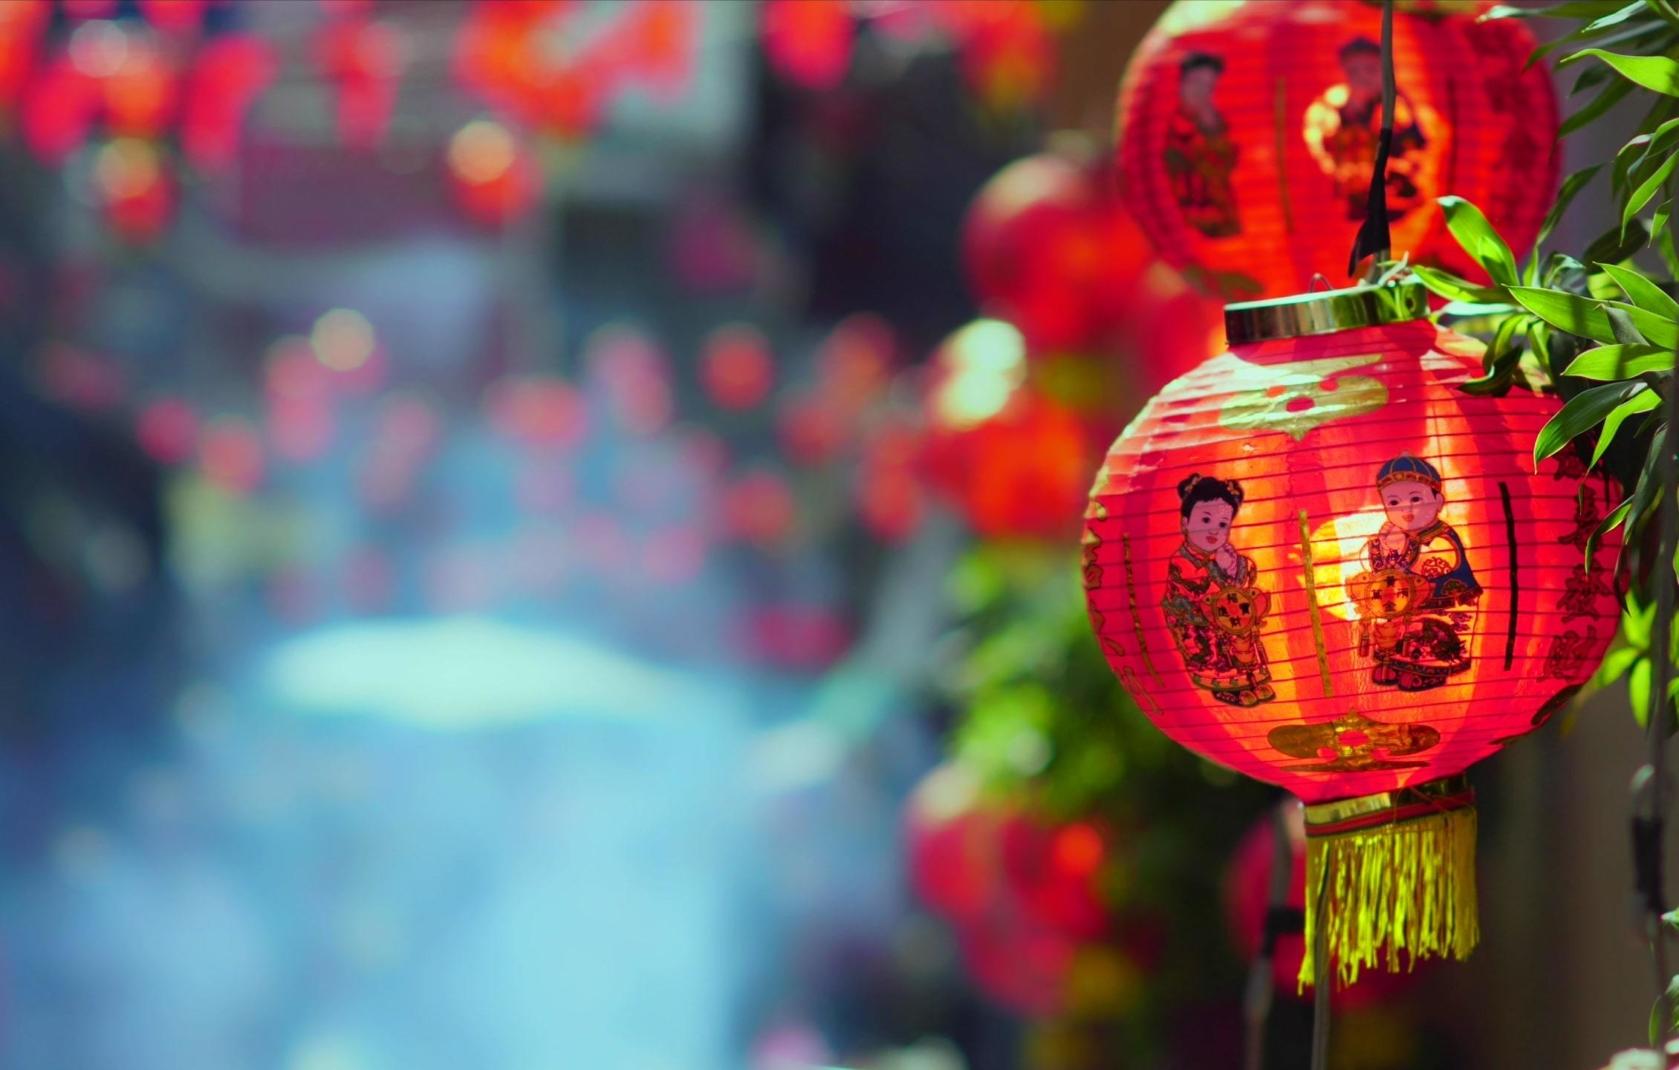 ChineseNewYear_header_v1_1st_frame-1547118235.jpg